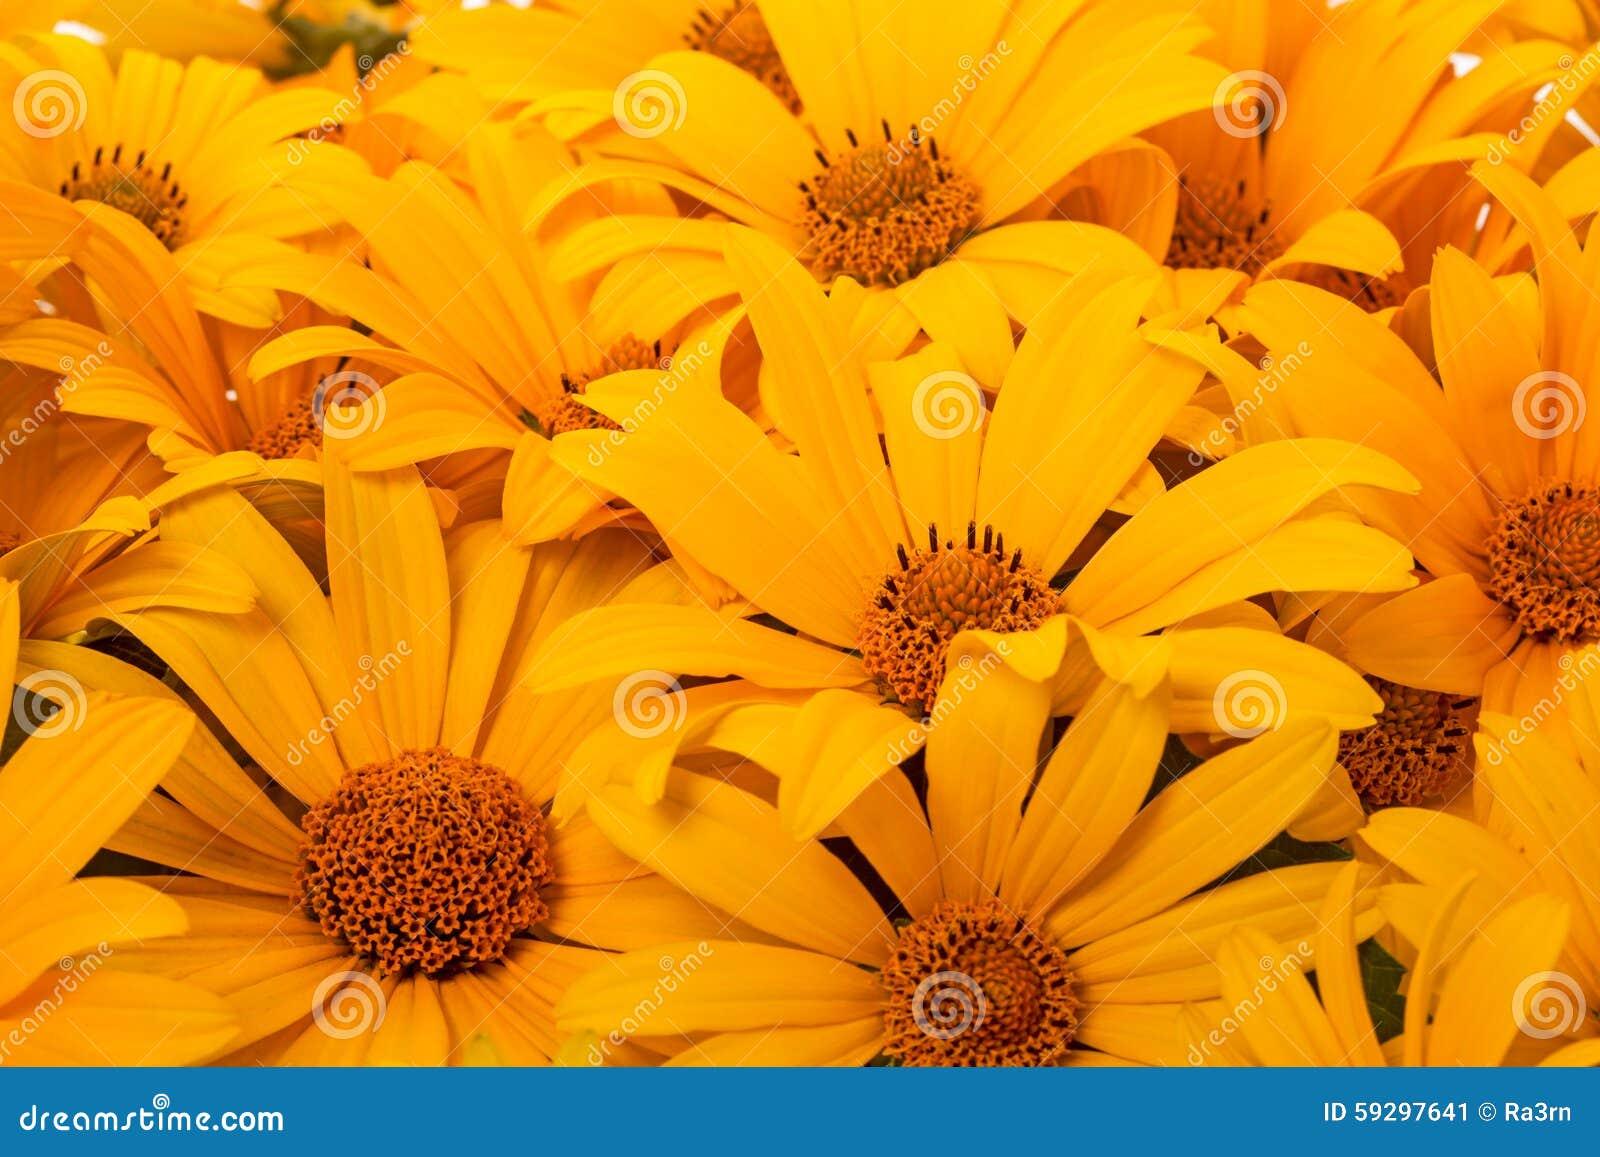 Orange Flower Like A Daisy Stock Image Image Of Daisy 59297641